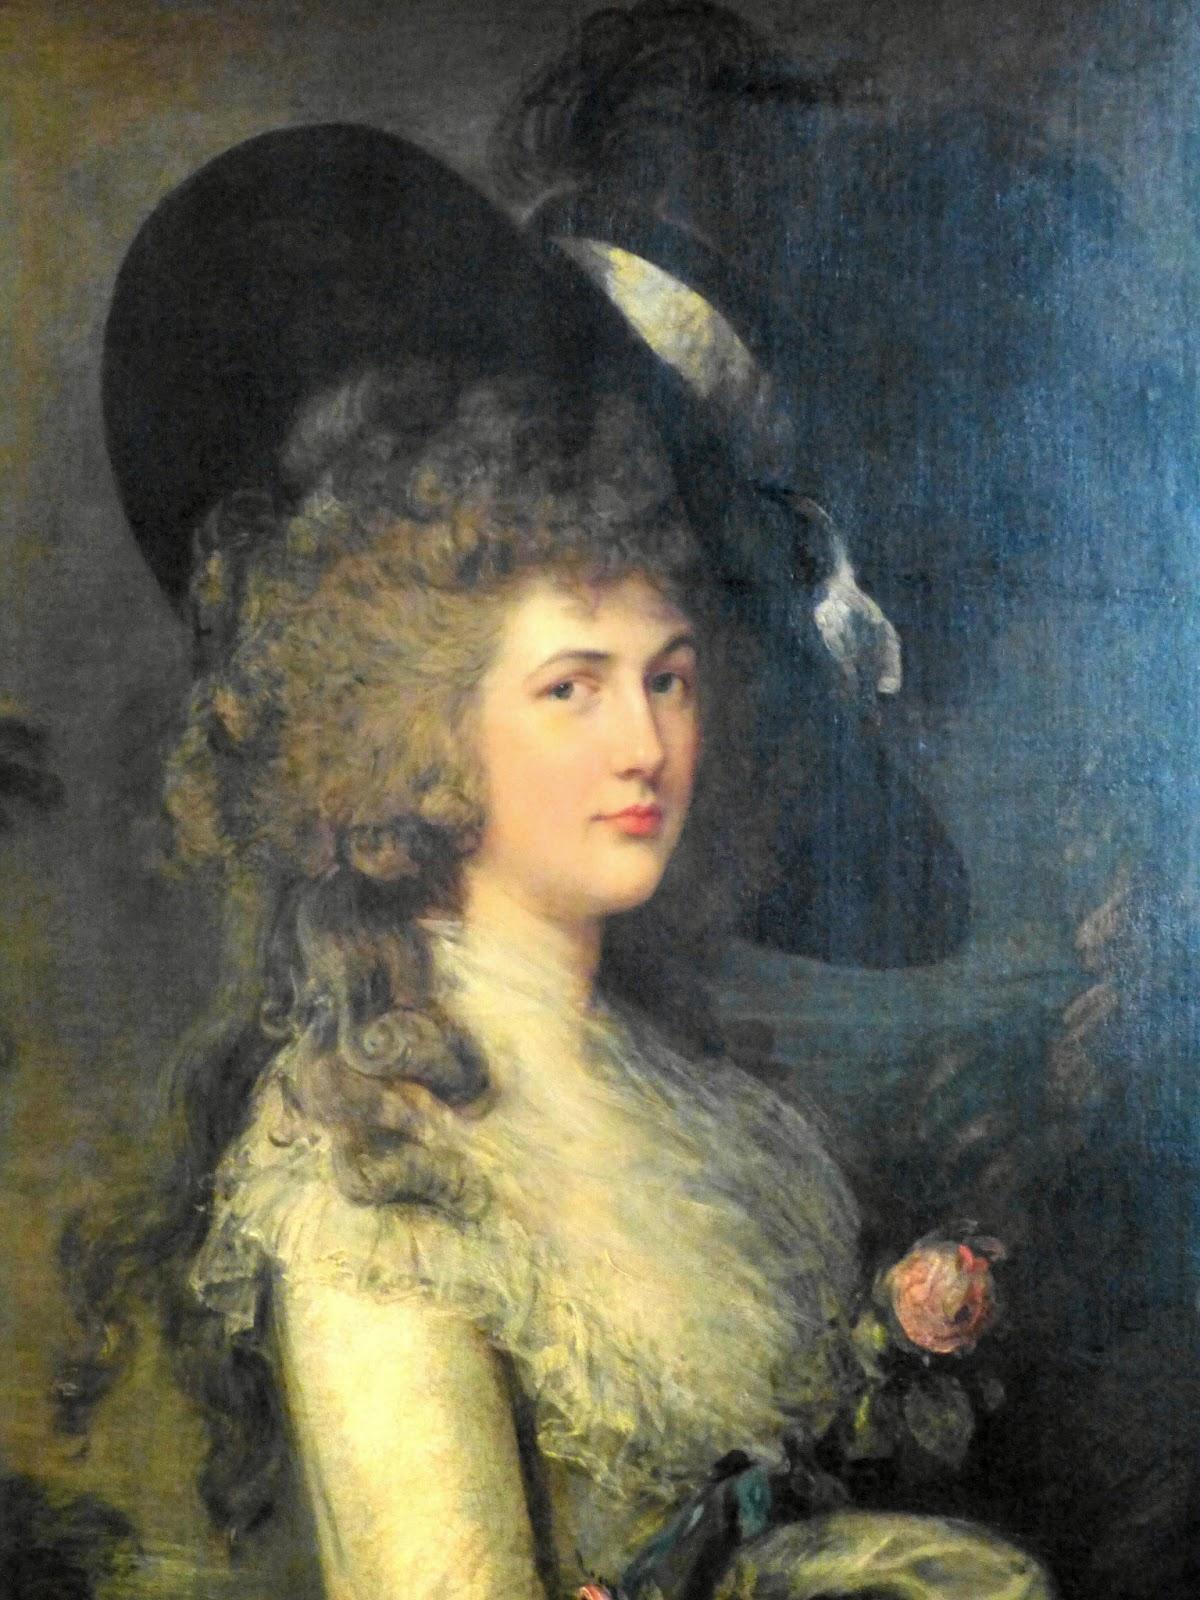 Georgiana, Duchess of Devonshire  by Thomas Gainsborough